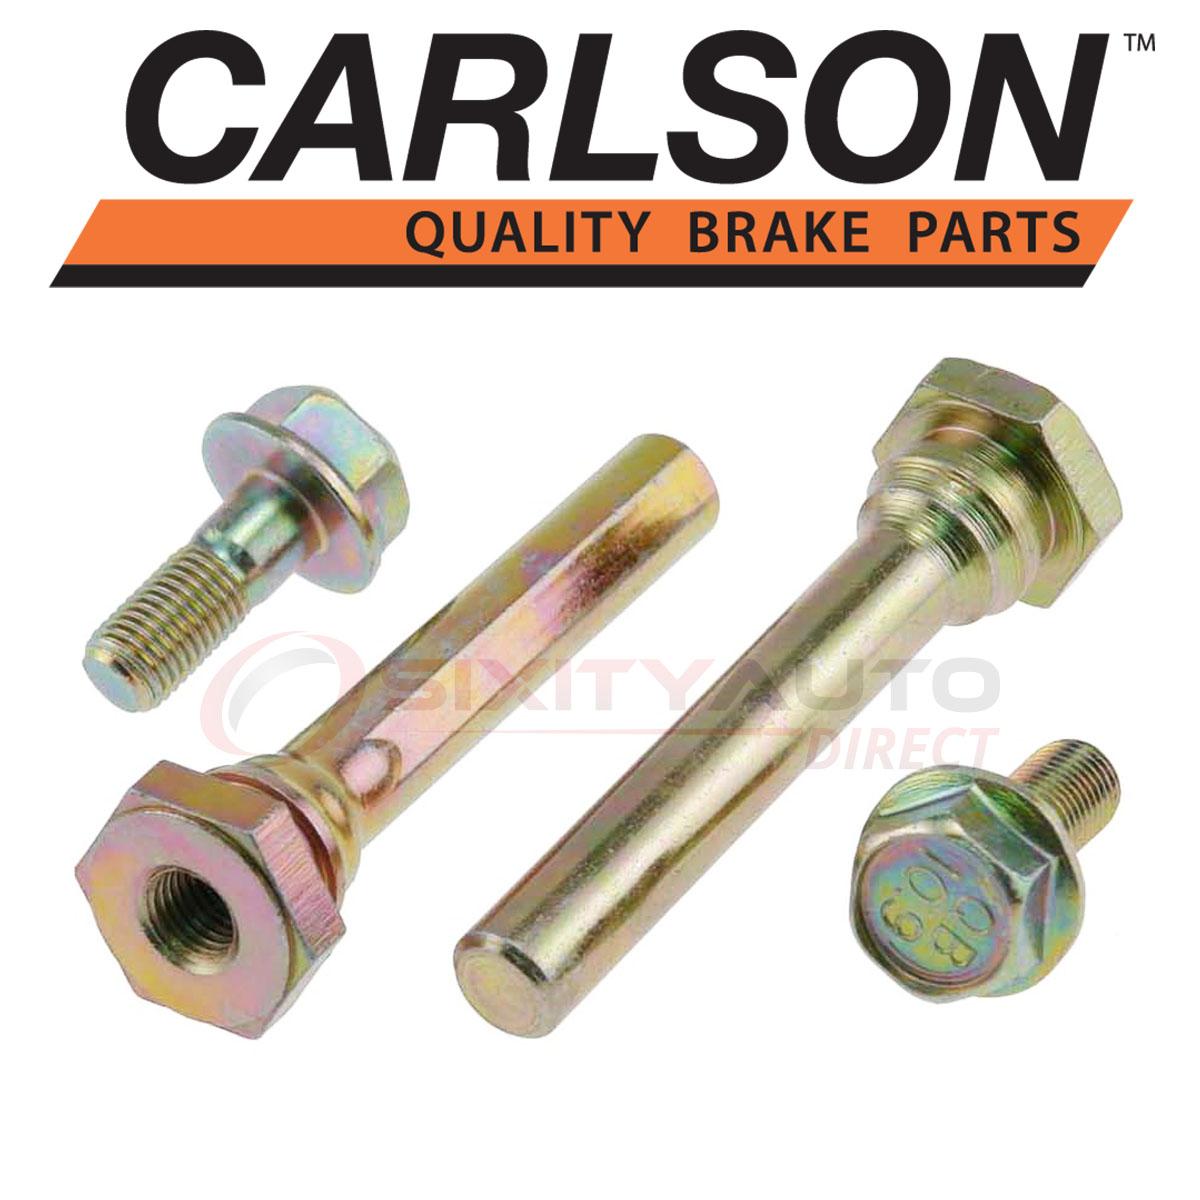 Disc Pad Service Hardware an Carlson 14028 Brake Caliper Guide Pin ...